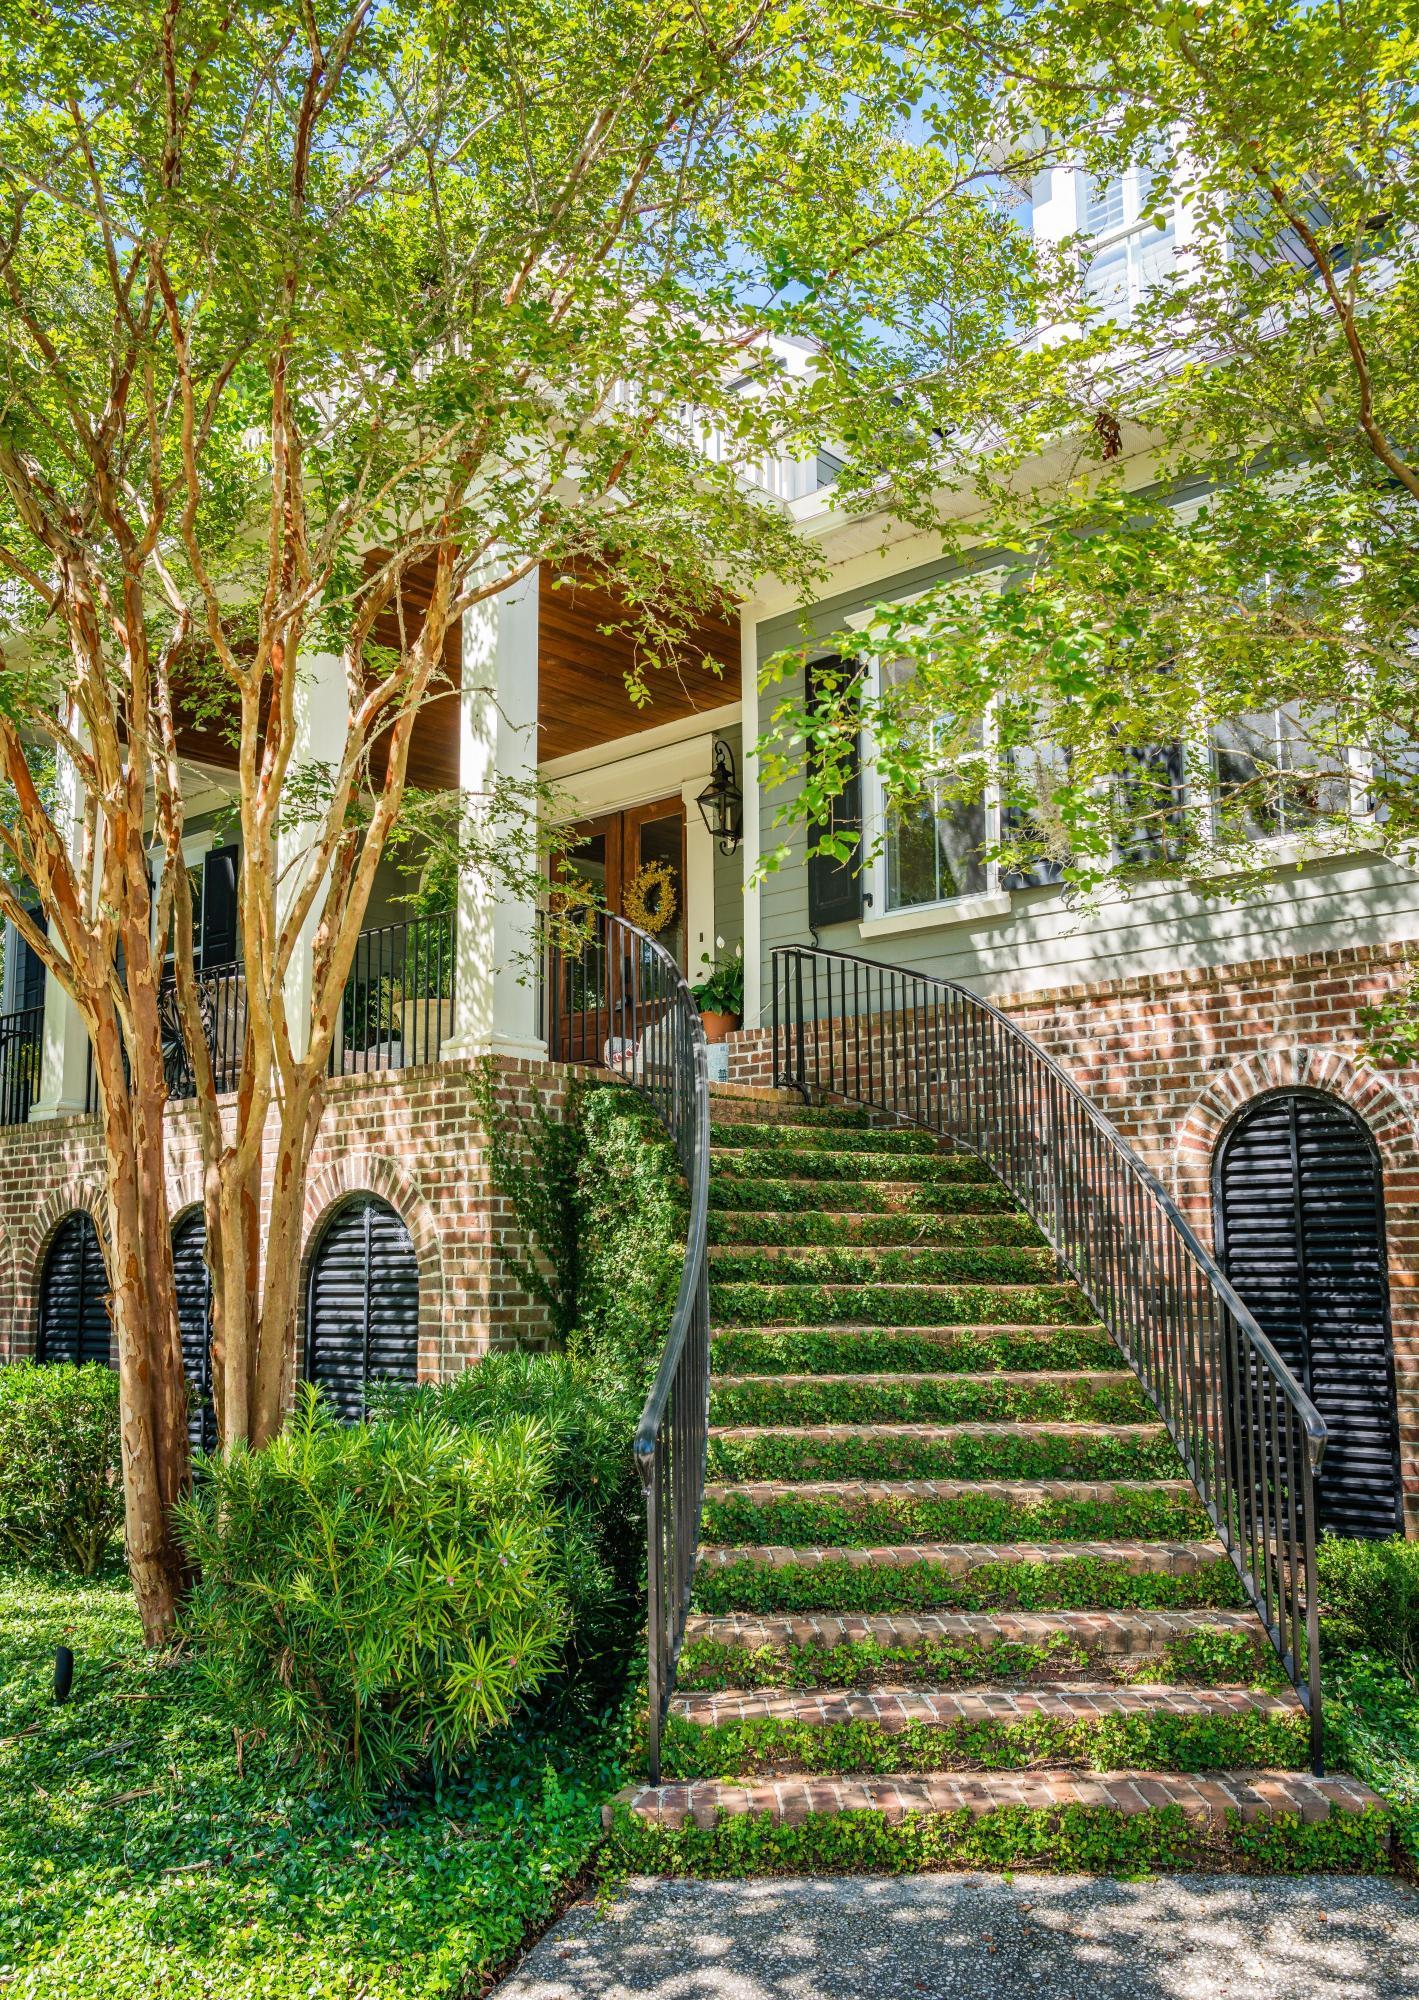 Broughton Hall Homes For Sale - 2058 Lakeshore, Pinopolis, SC - 81